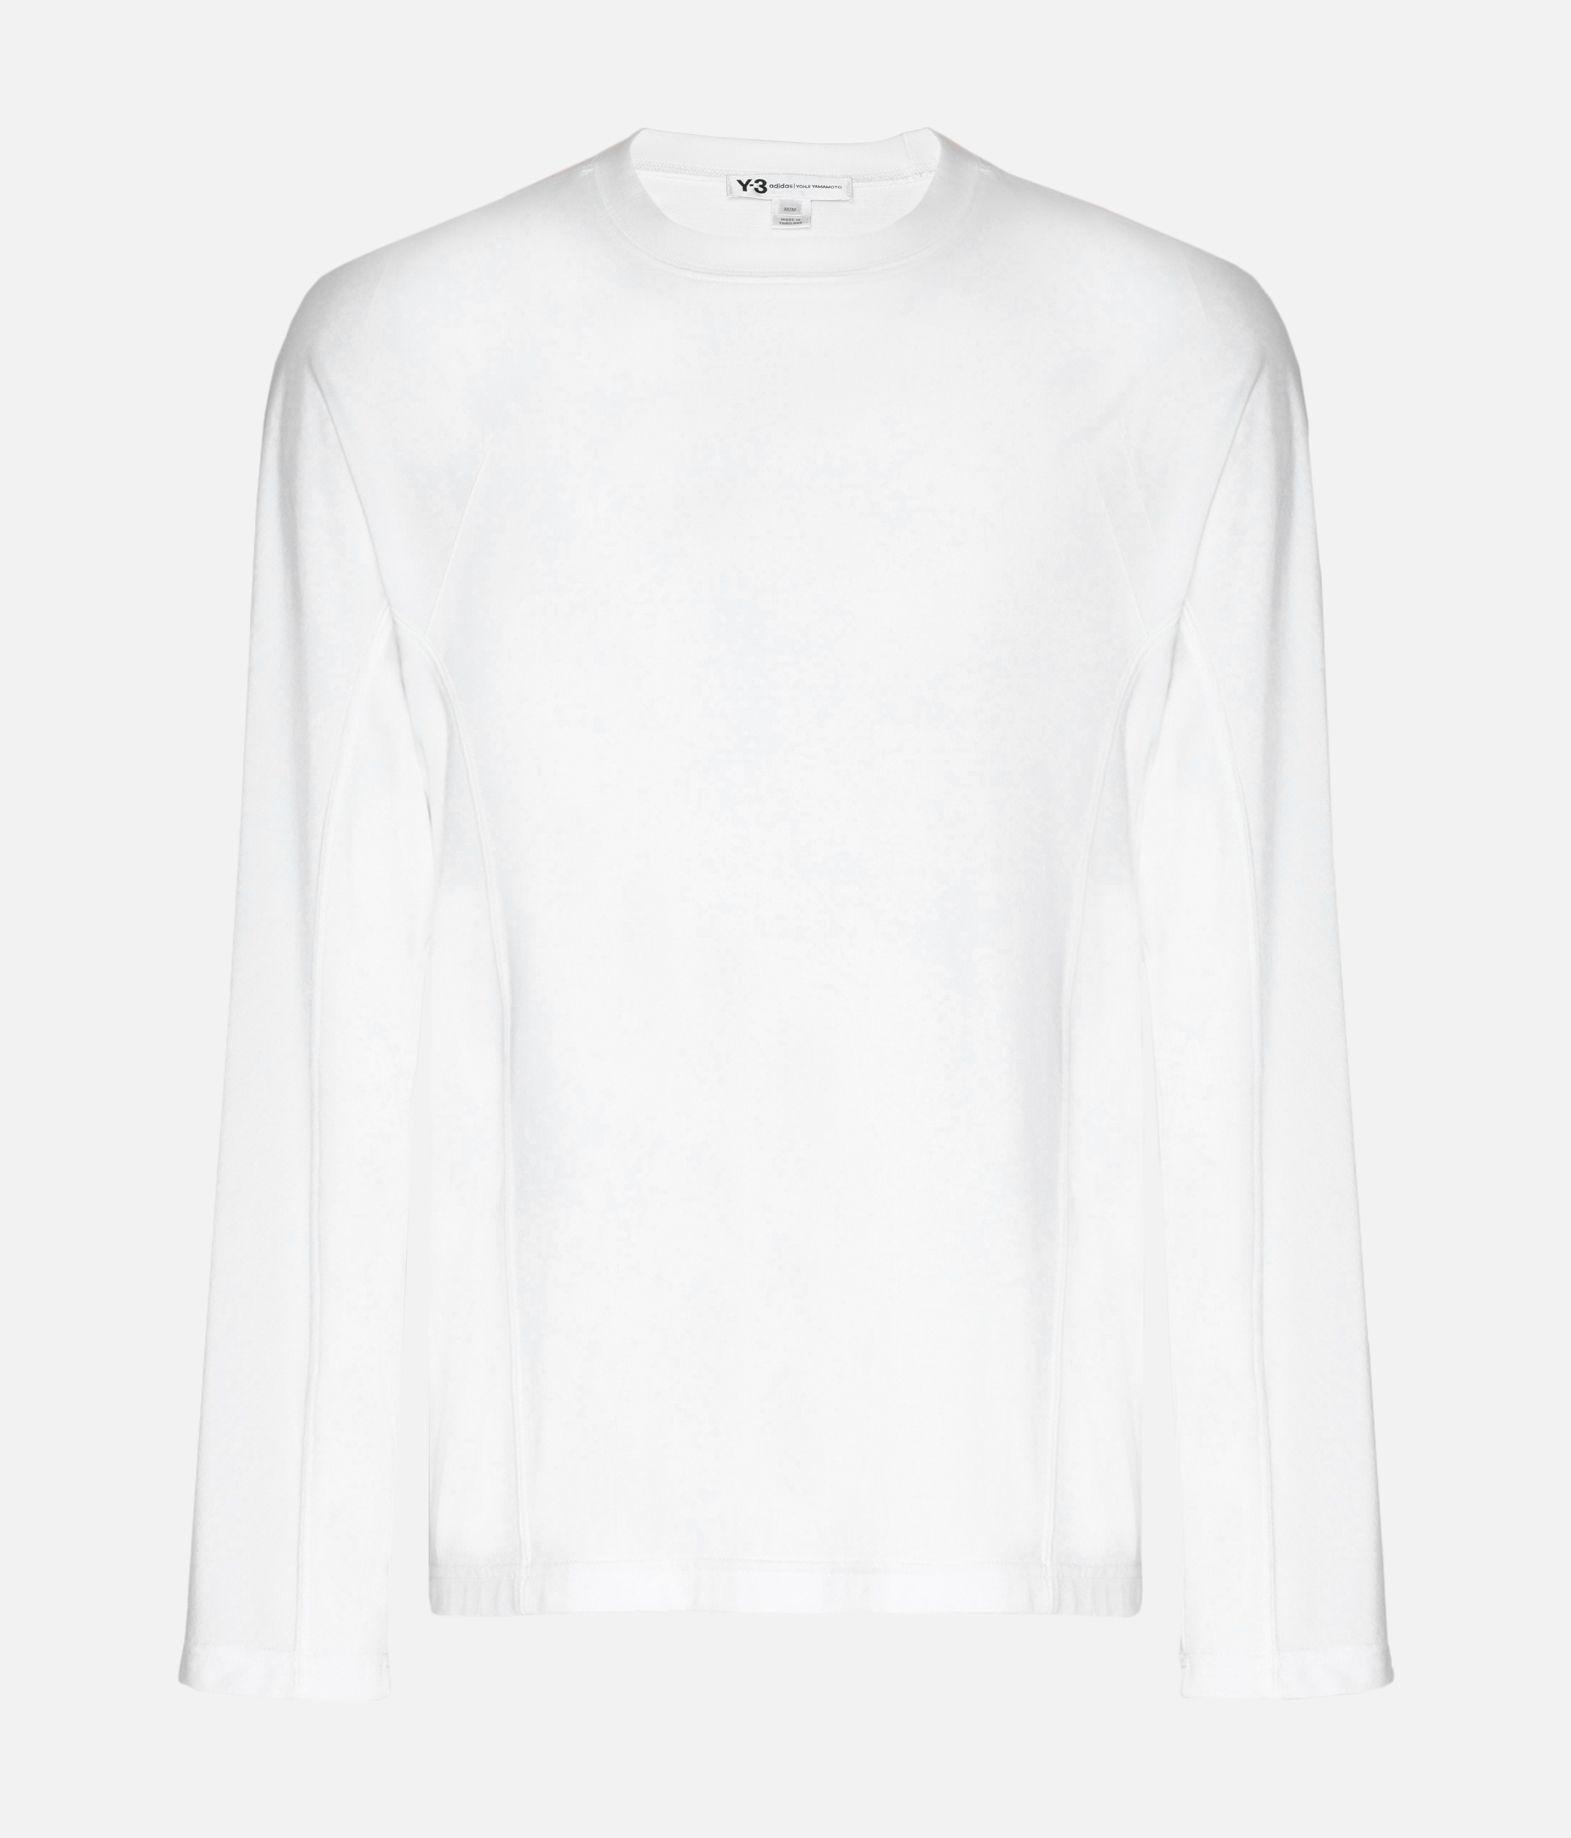 Y-3 Y-3 Classic Tee T-shirt maniche lunghe Uomo f